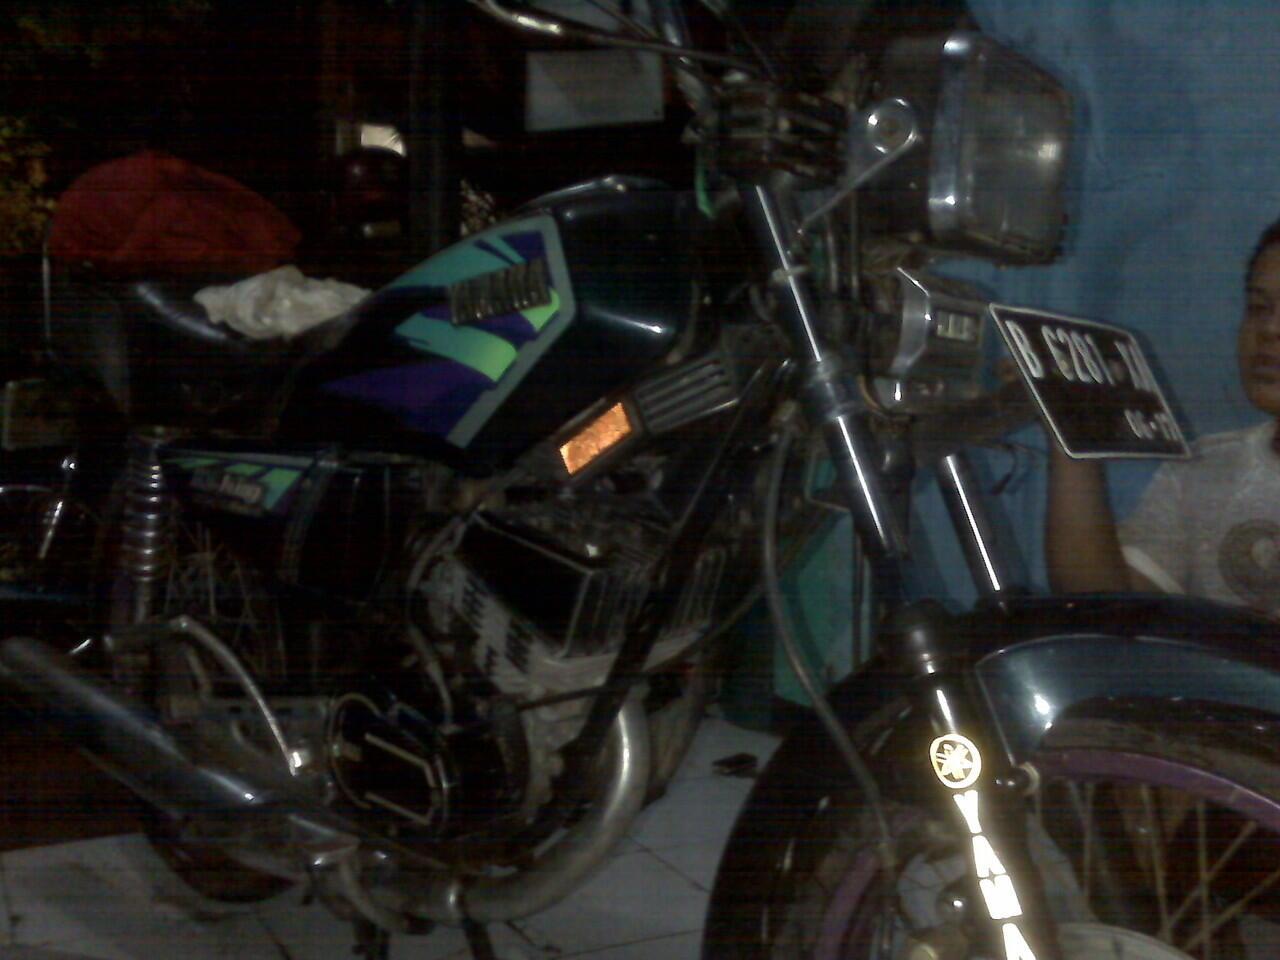 YAMAHA RX KING 97 ORIGINAL TANGAN PERTAMA DARI BARU PAJAK PANJANG